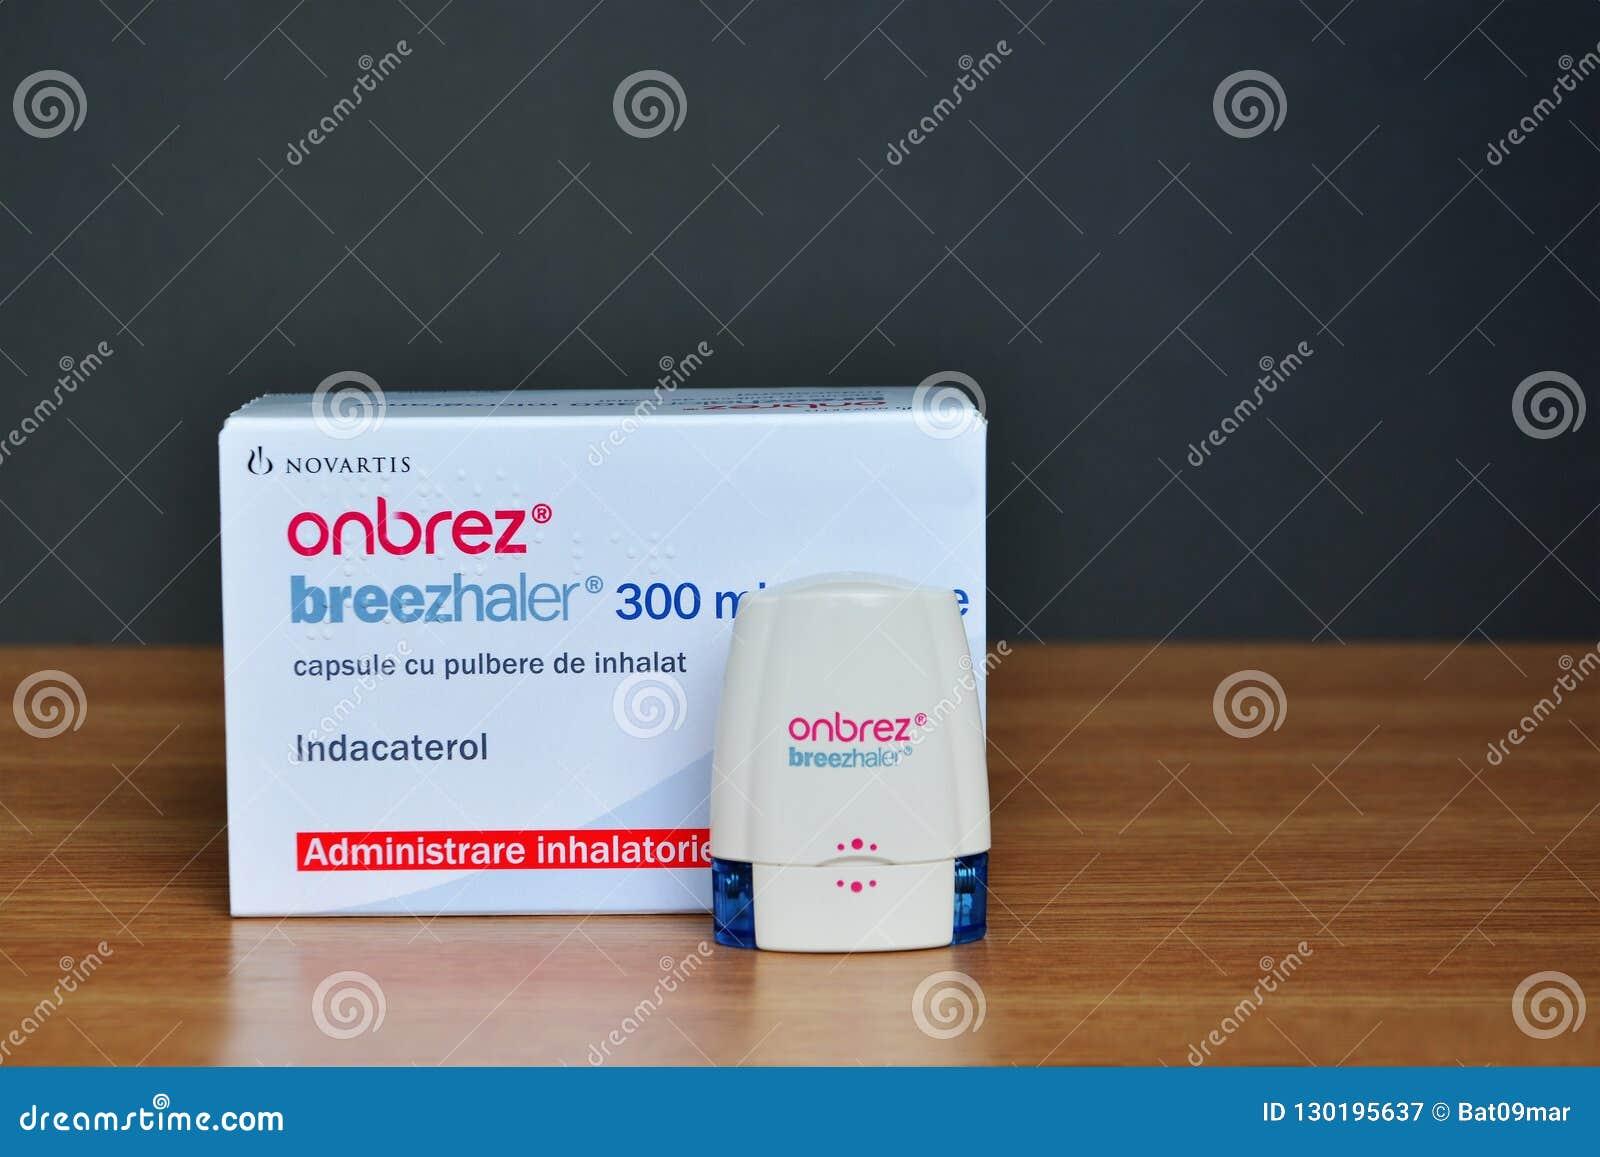 Onbrez Breezhaler Indacaterol Inhaler Device And Box Editorial